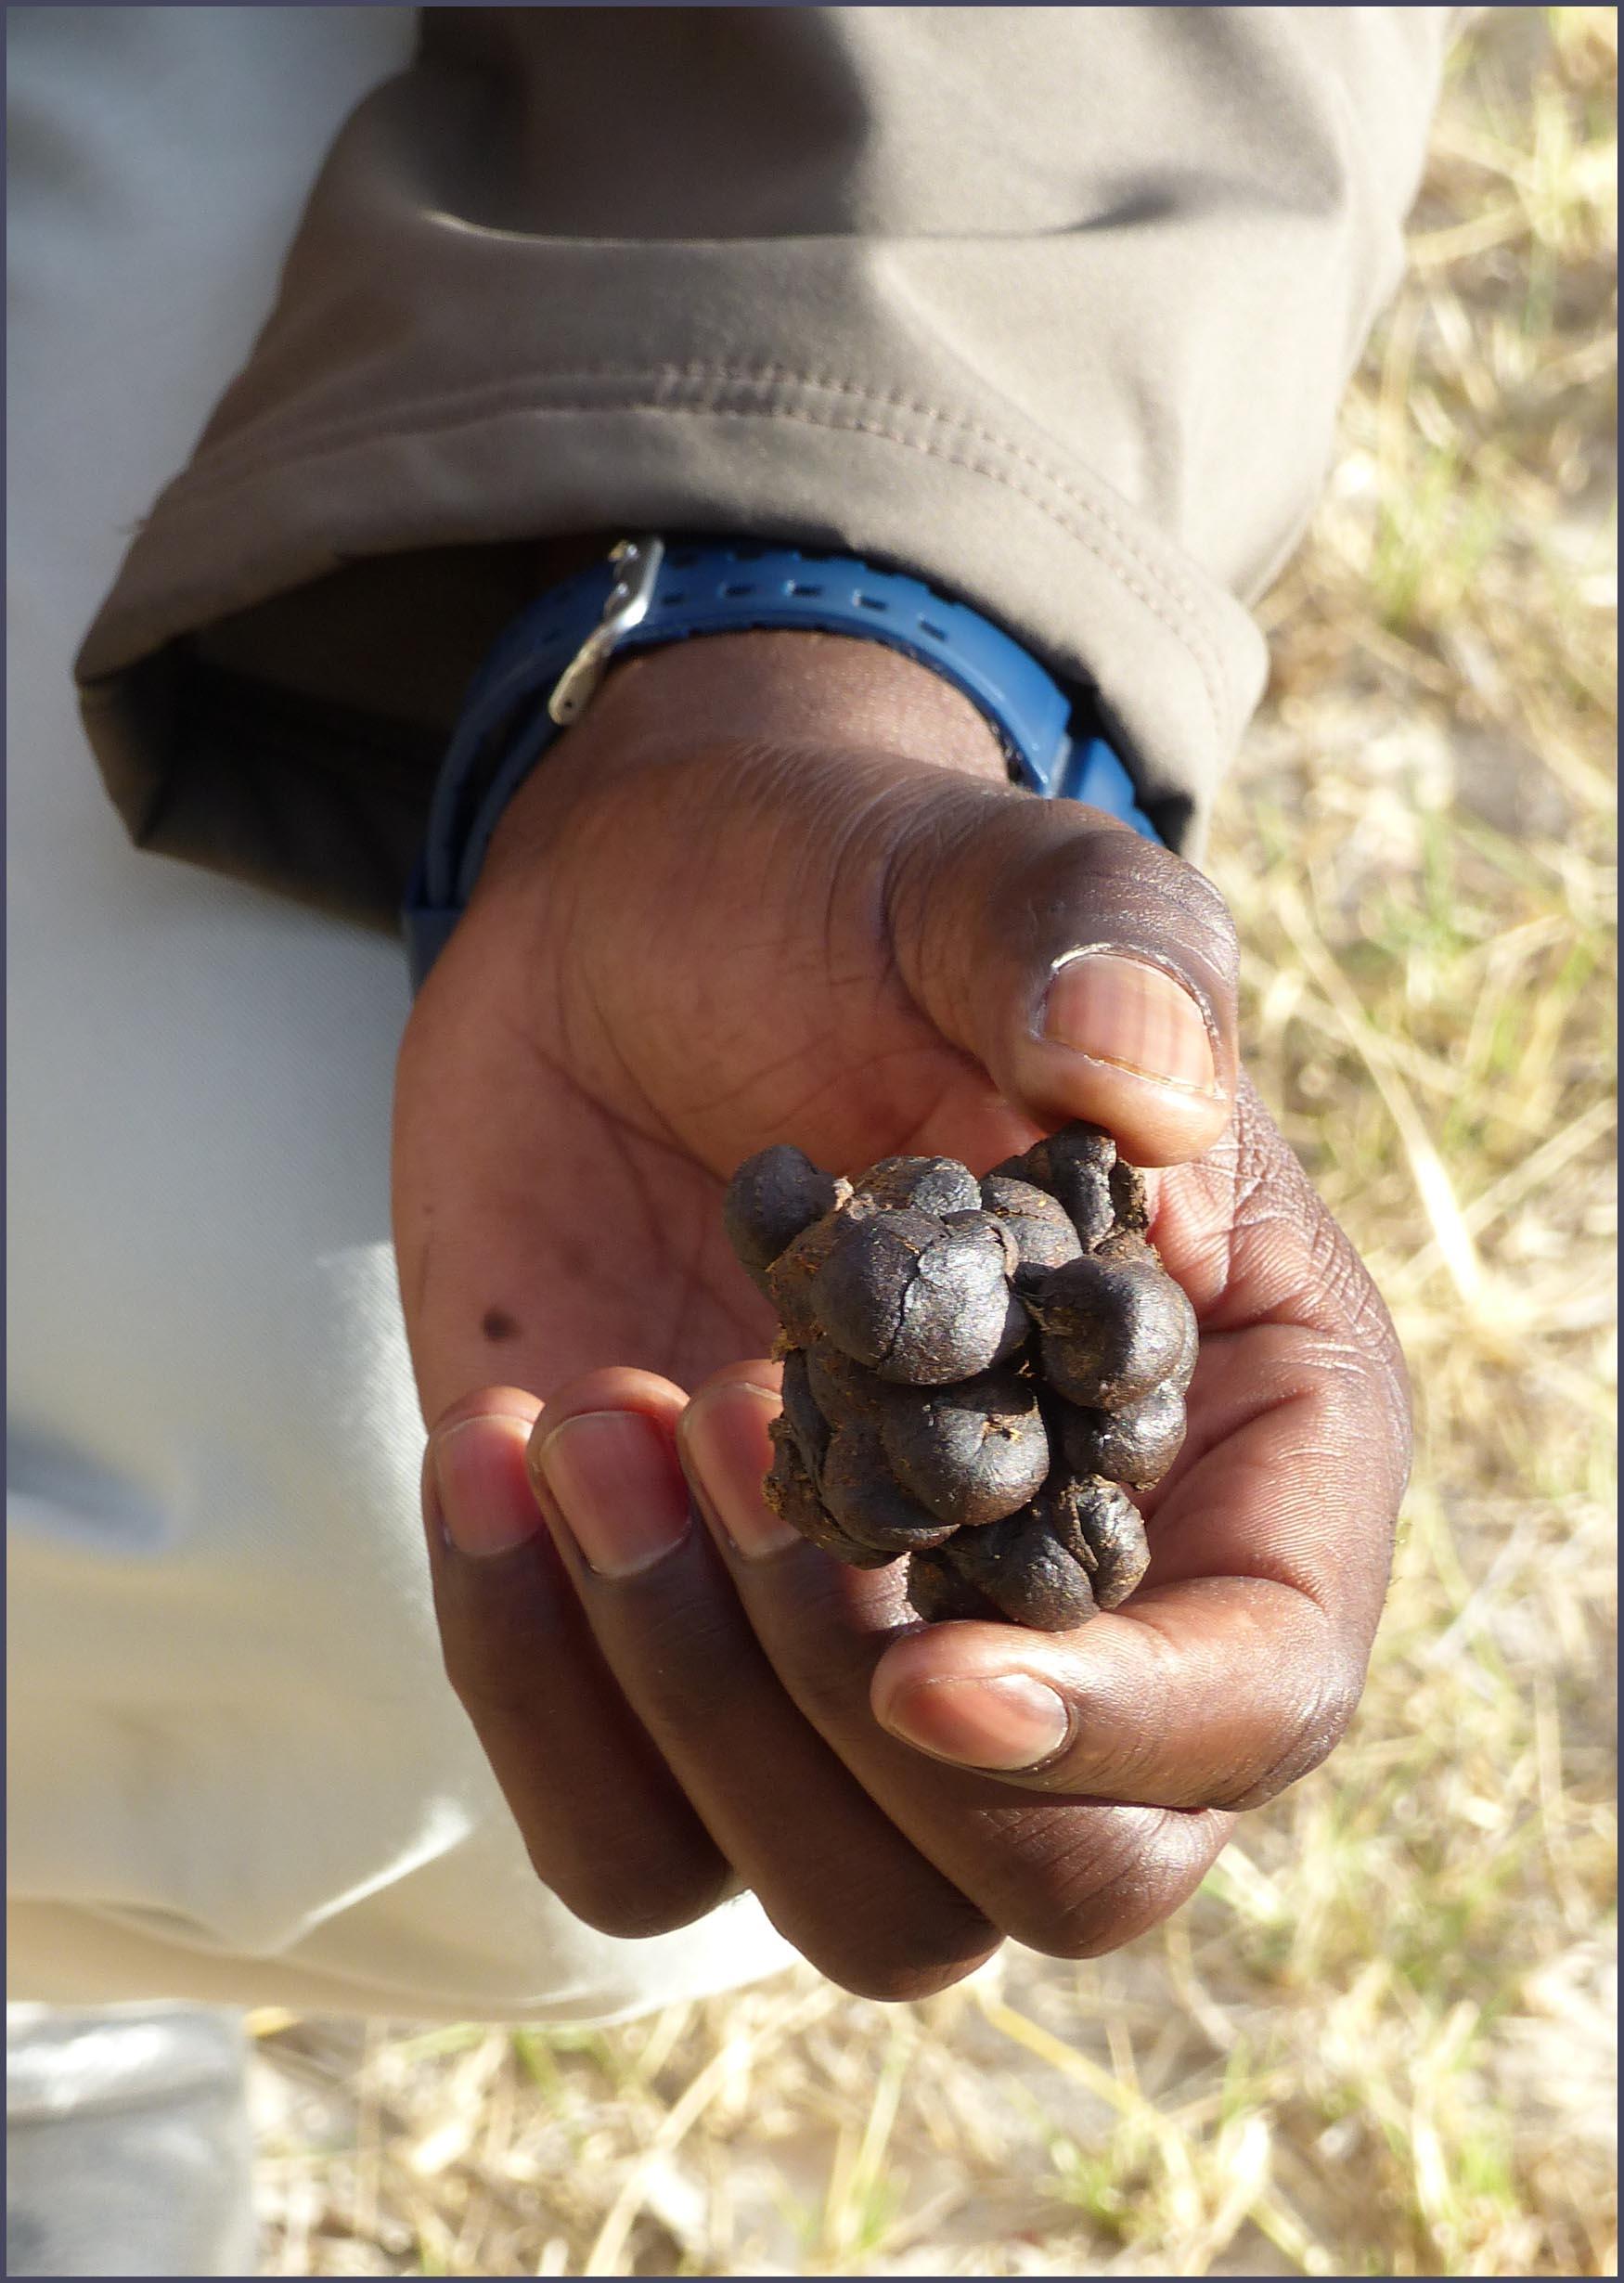 Hand holding animal dung